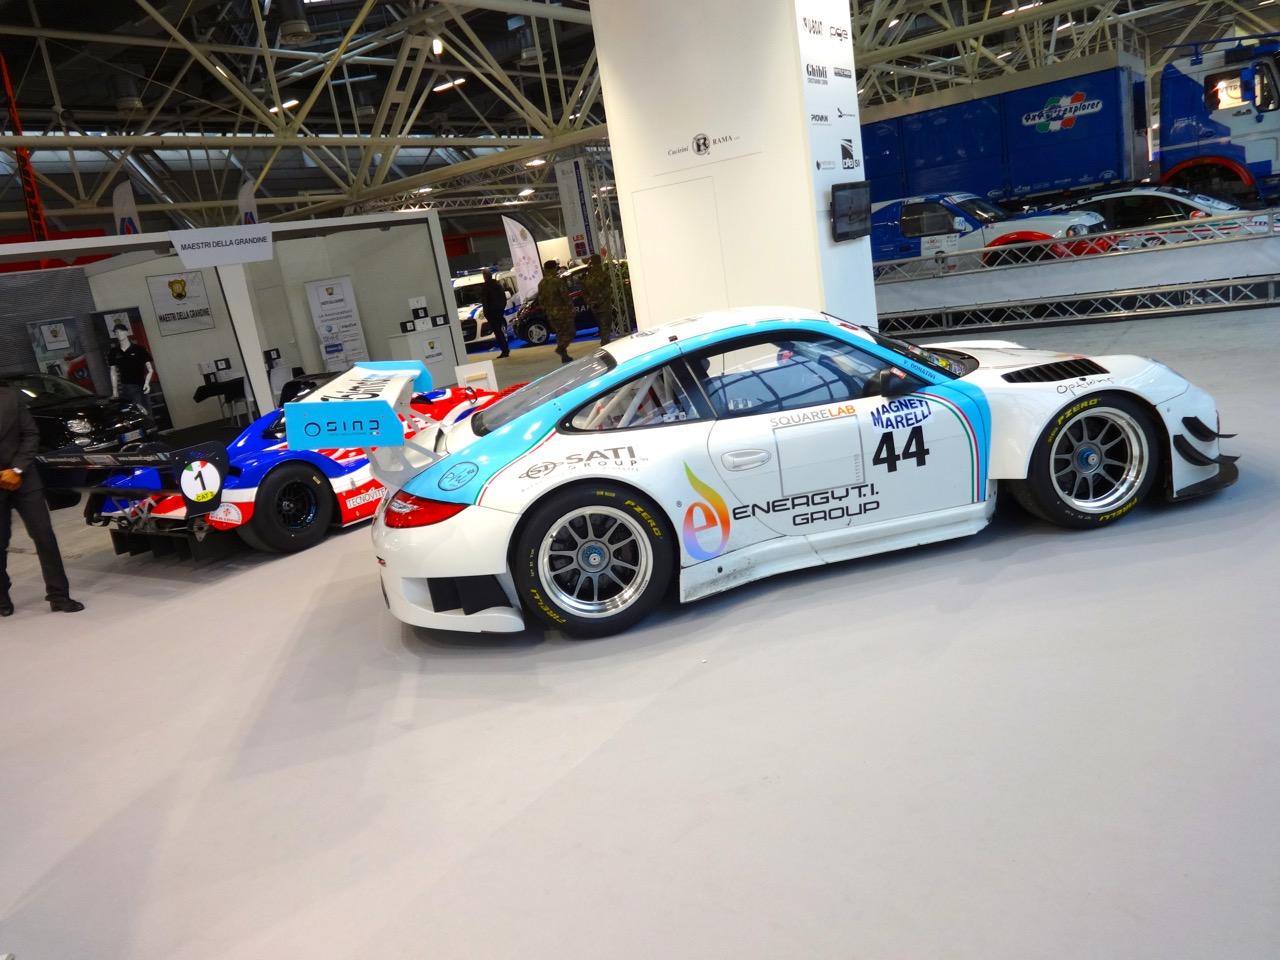 Motor Show 2014 - Tour Virtuale